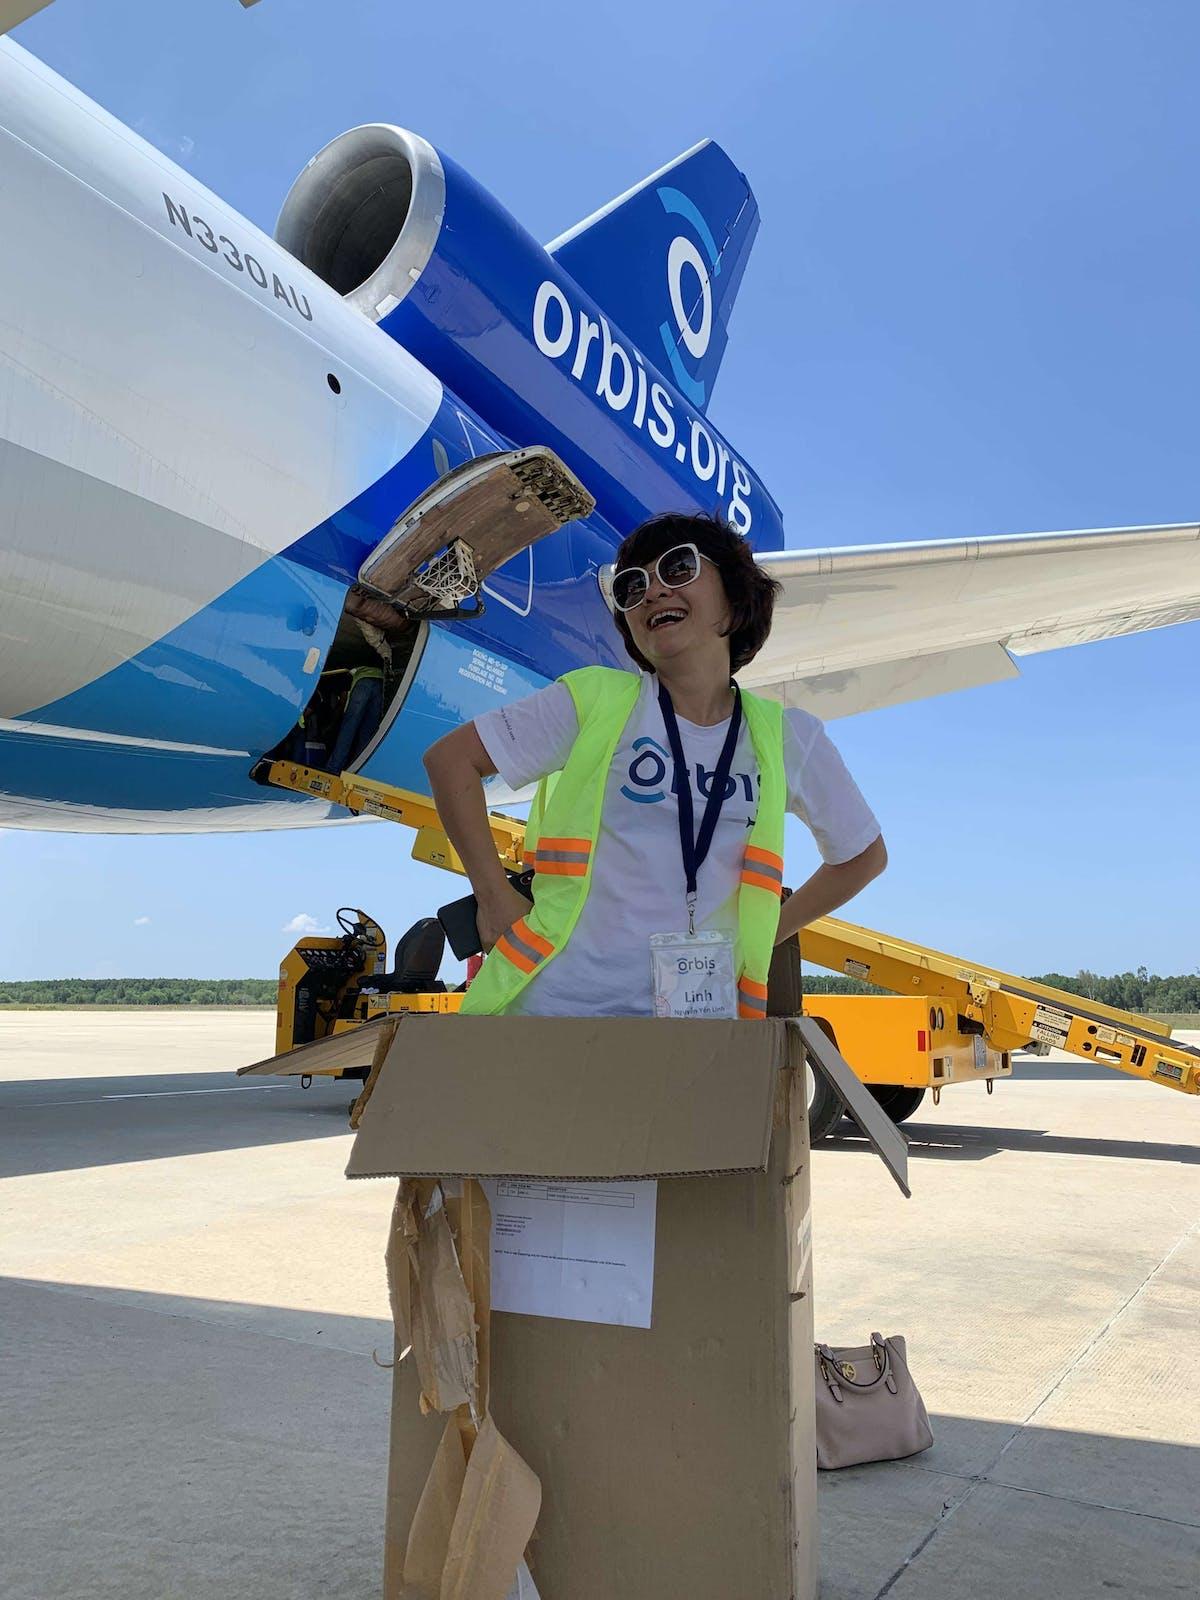 Packing up the Orbis Flying Eye Hospital in Vietnam